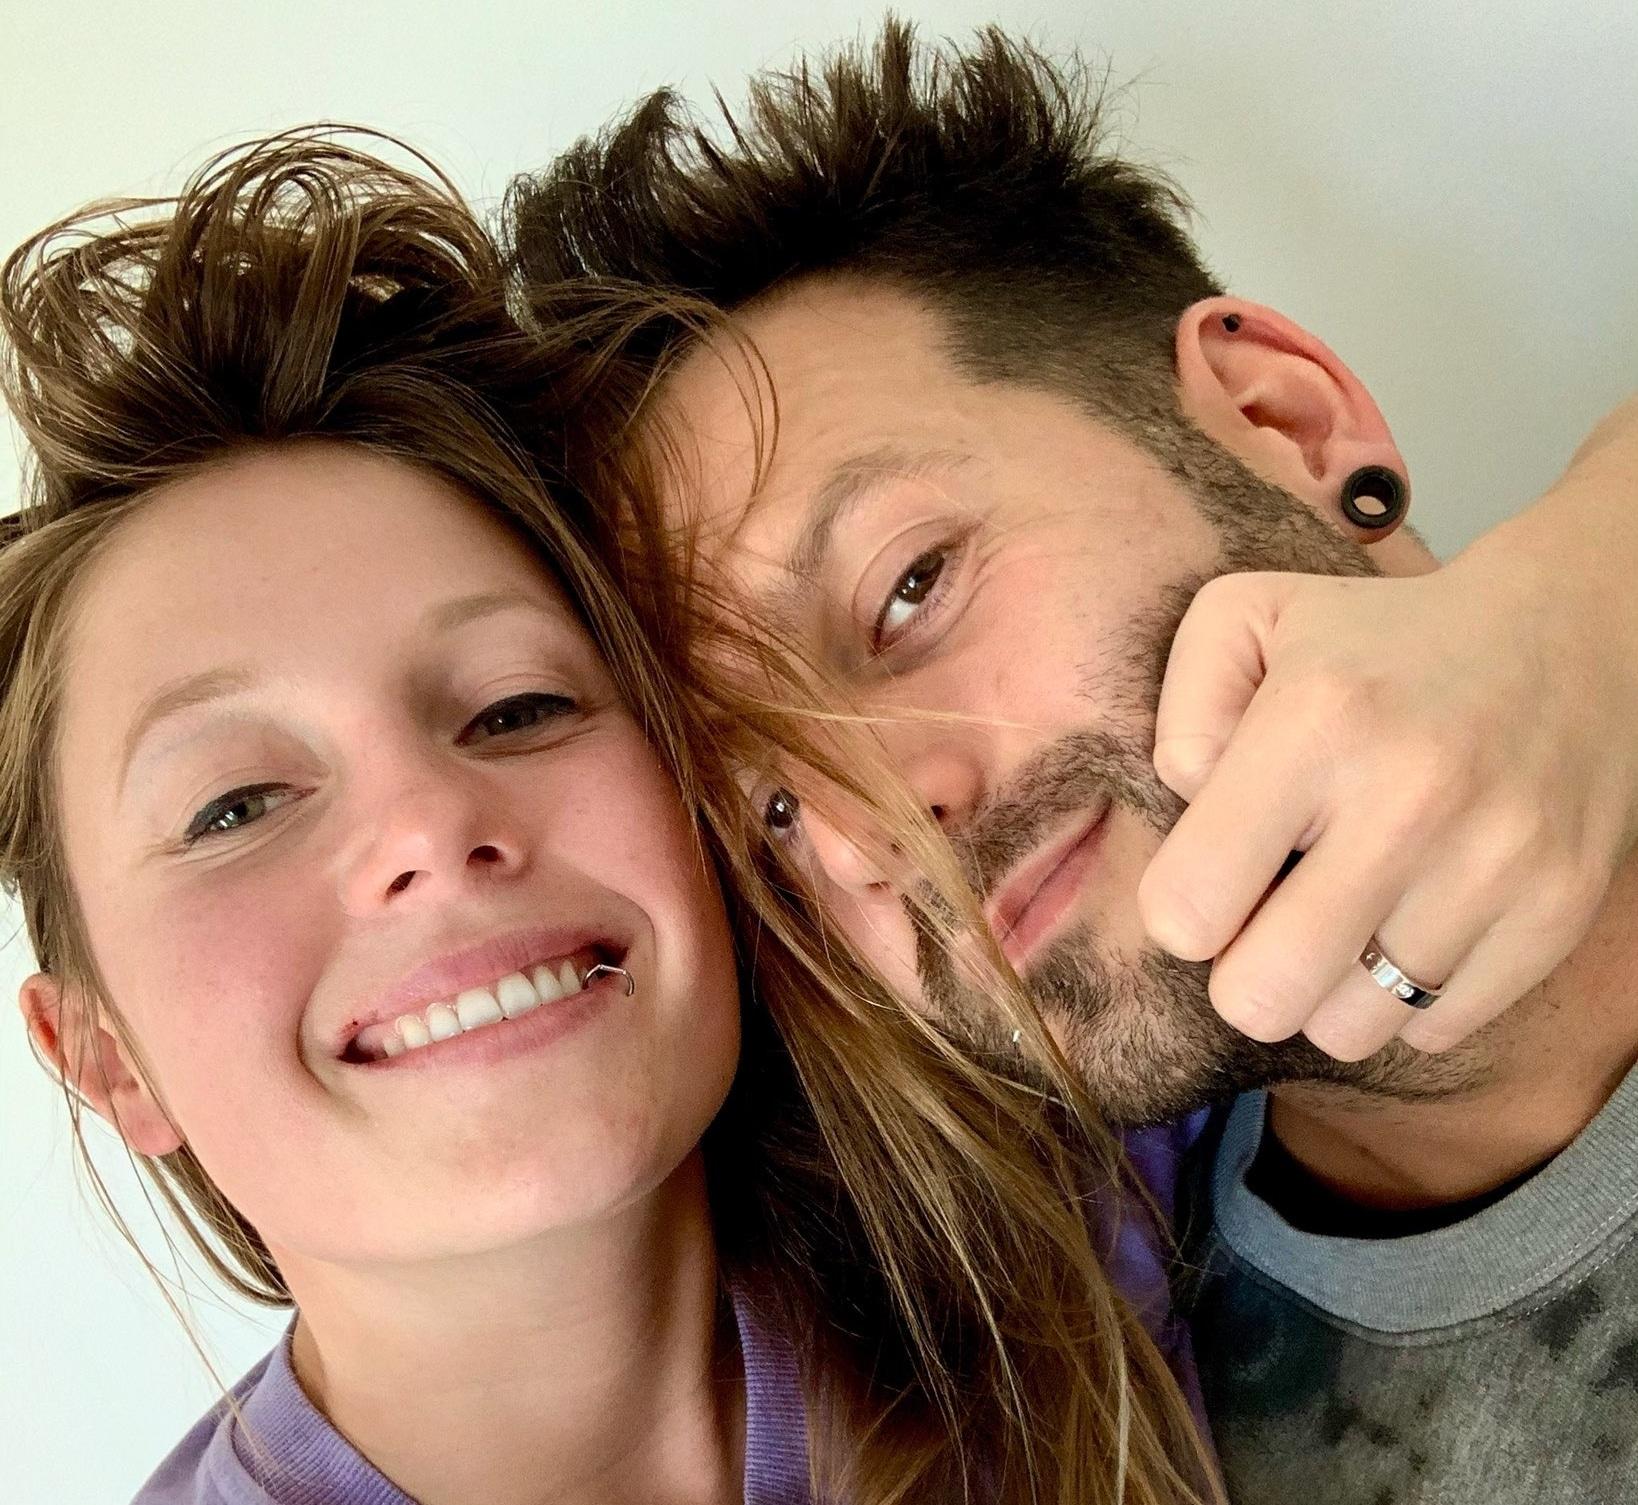 Charlotte de Witte & Enrico Sangiuliano engaged